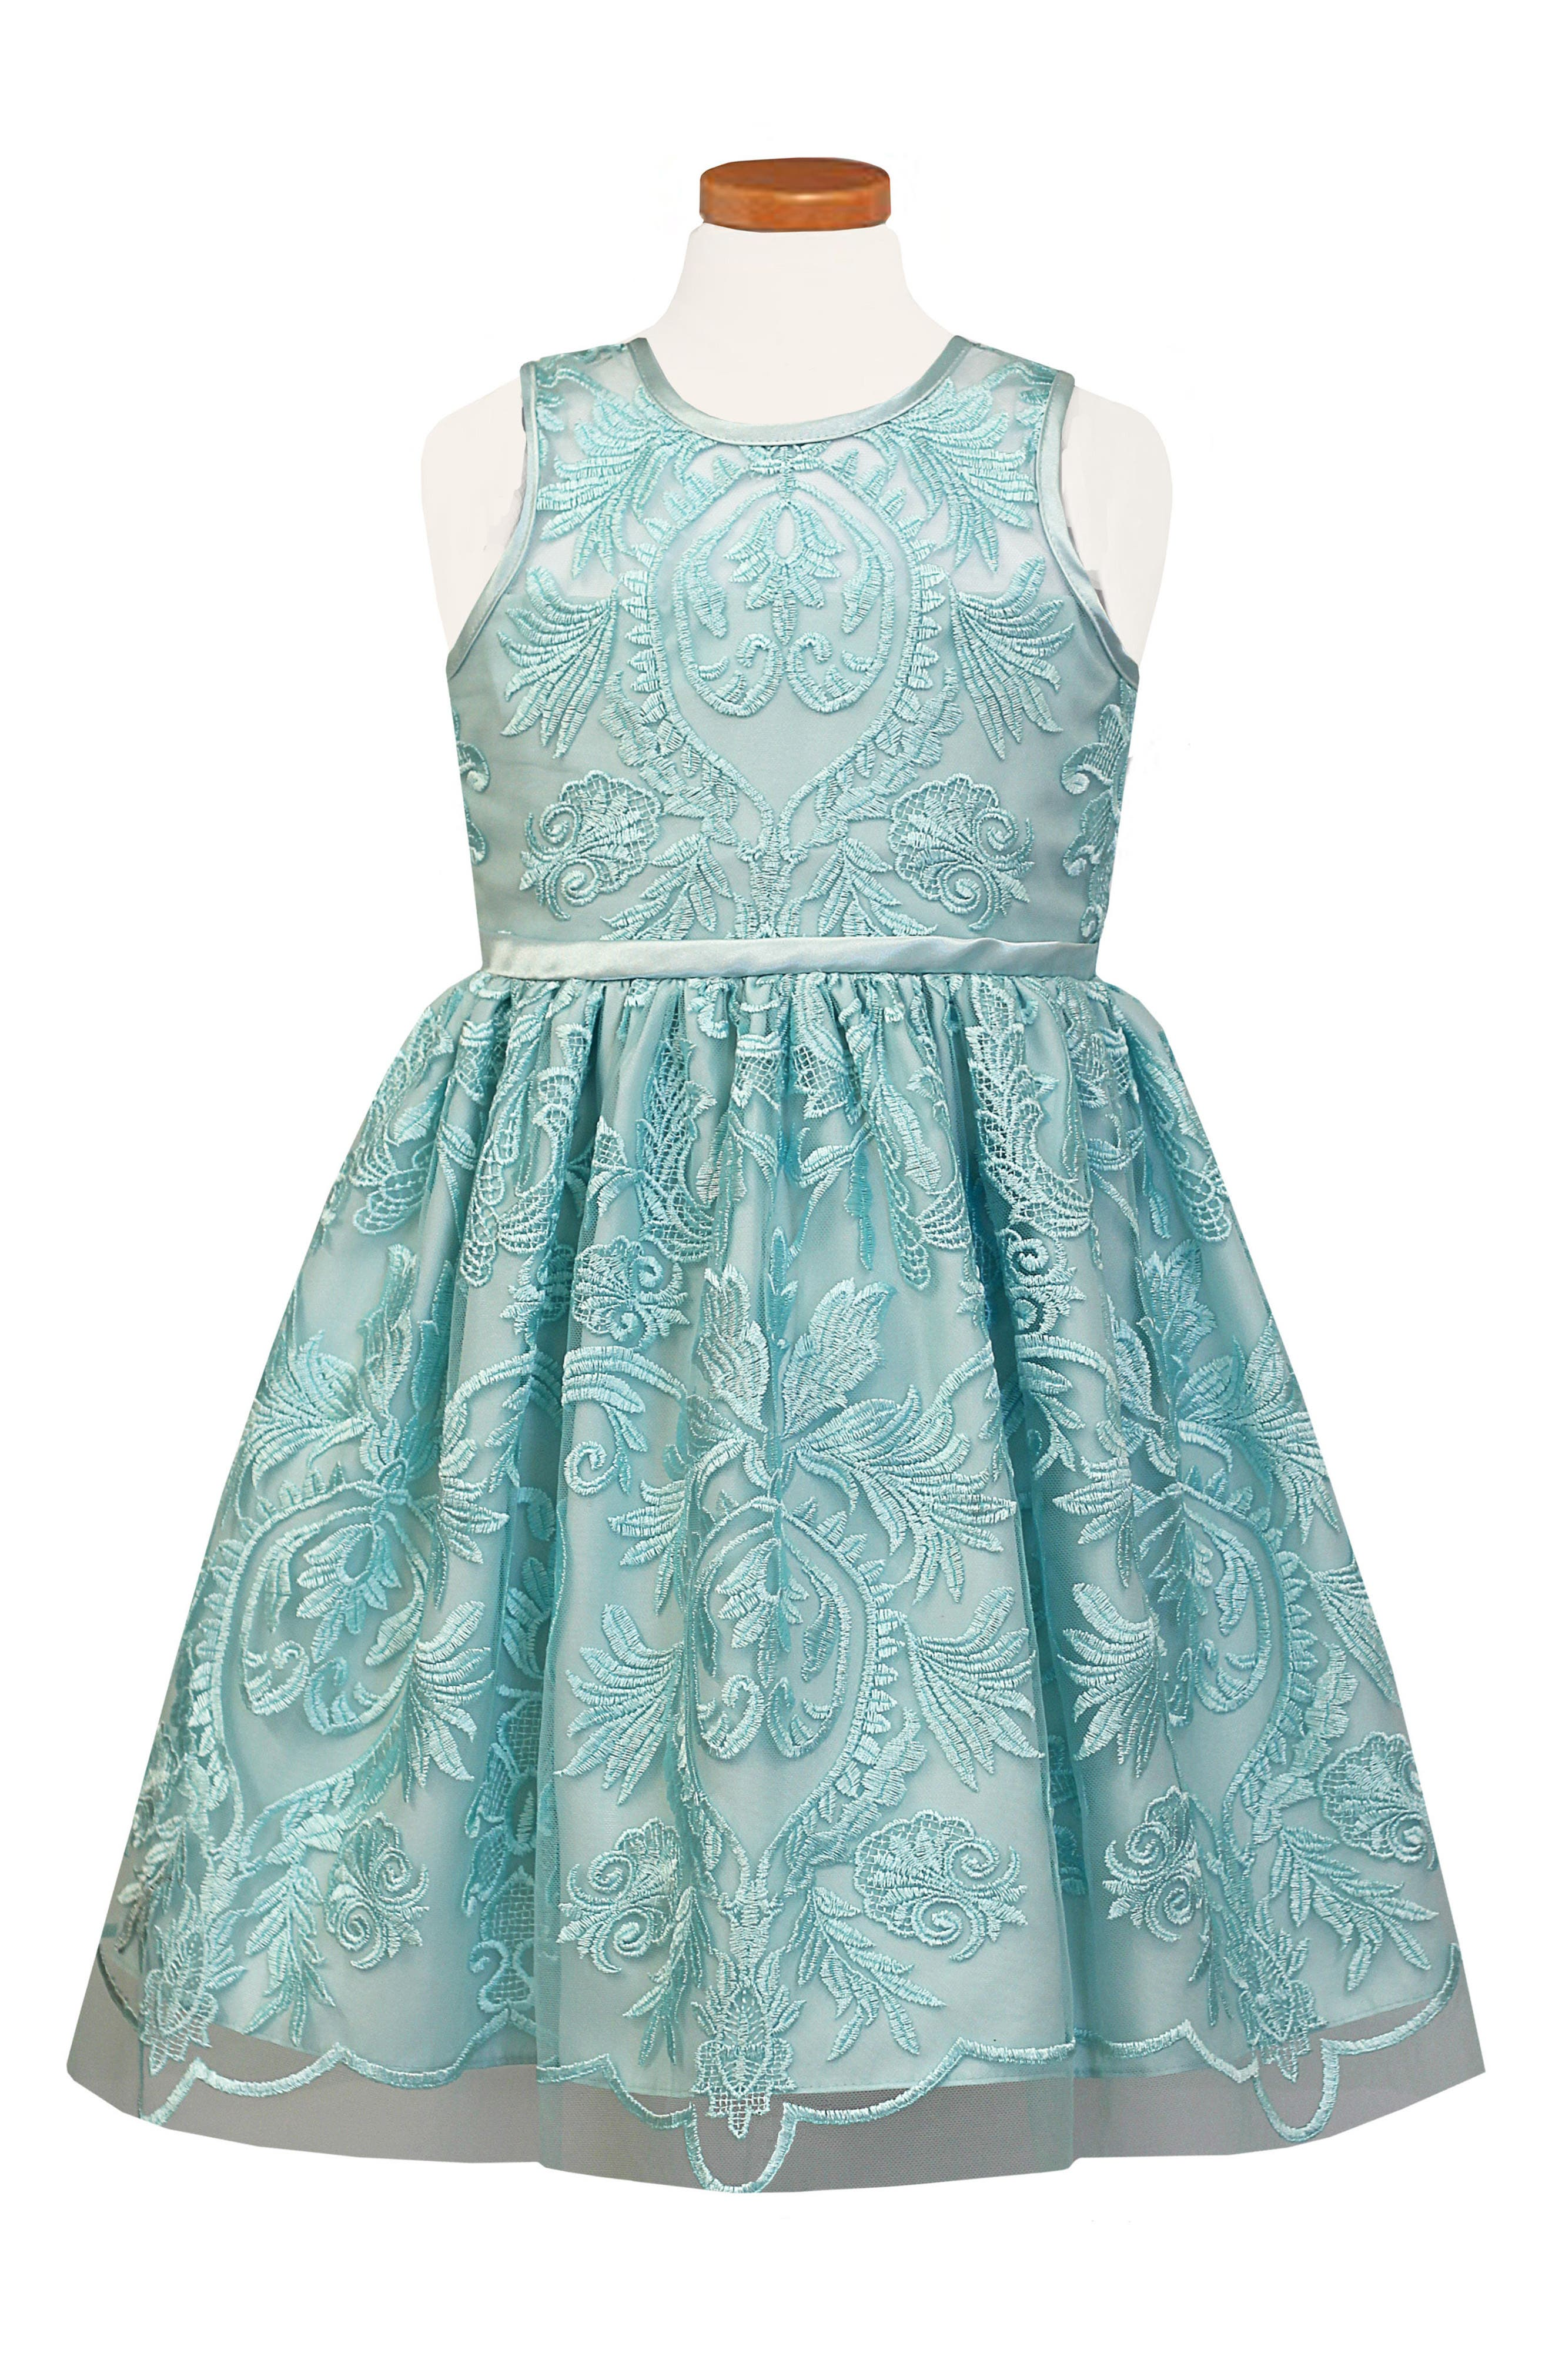 Main Image - Sorbet Embroidered Fit & Flare Dress (Toddler Girls & Big Girls)